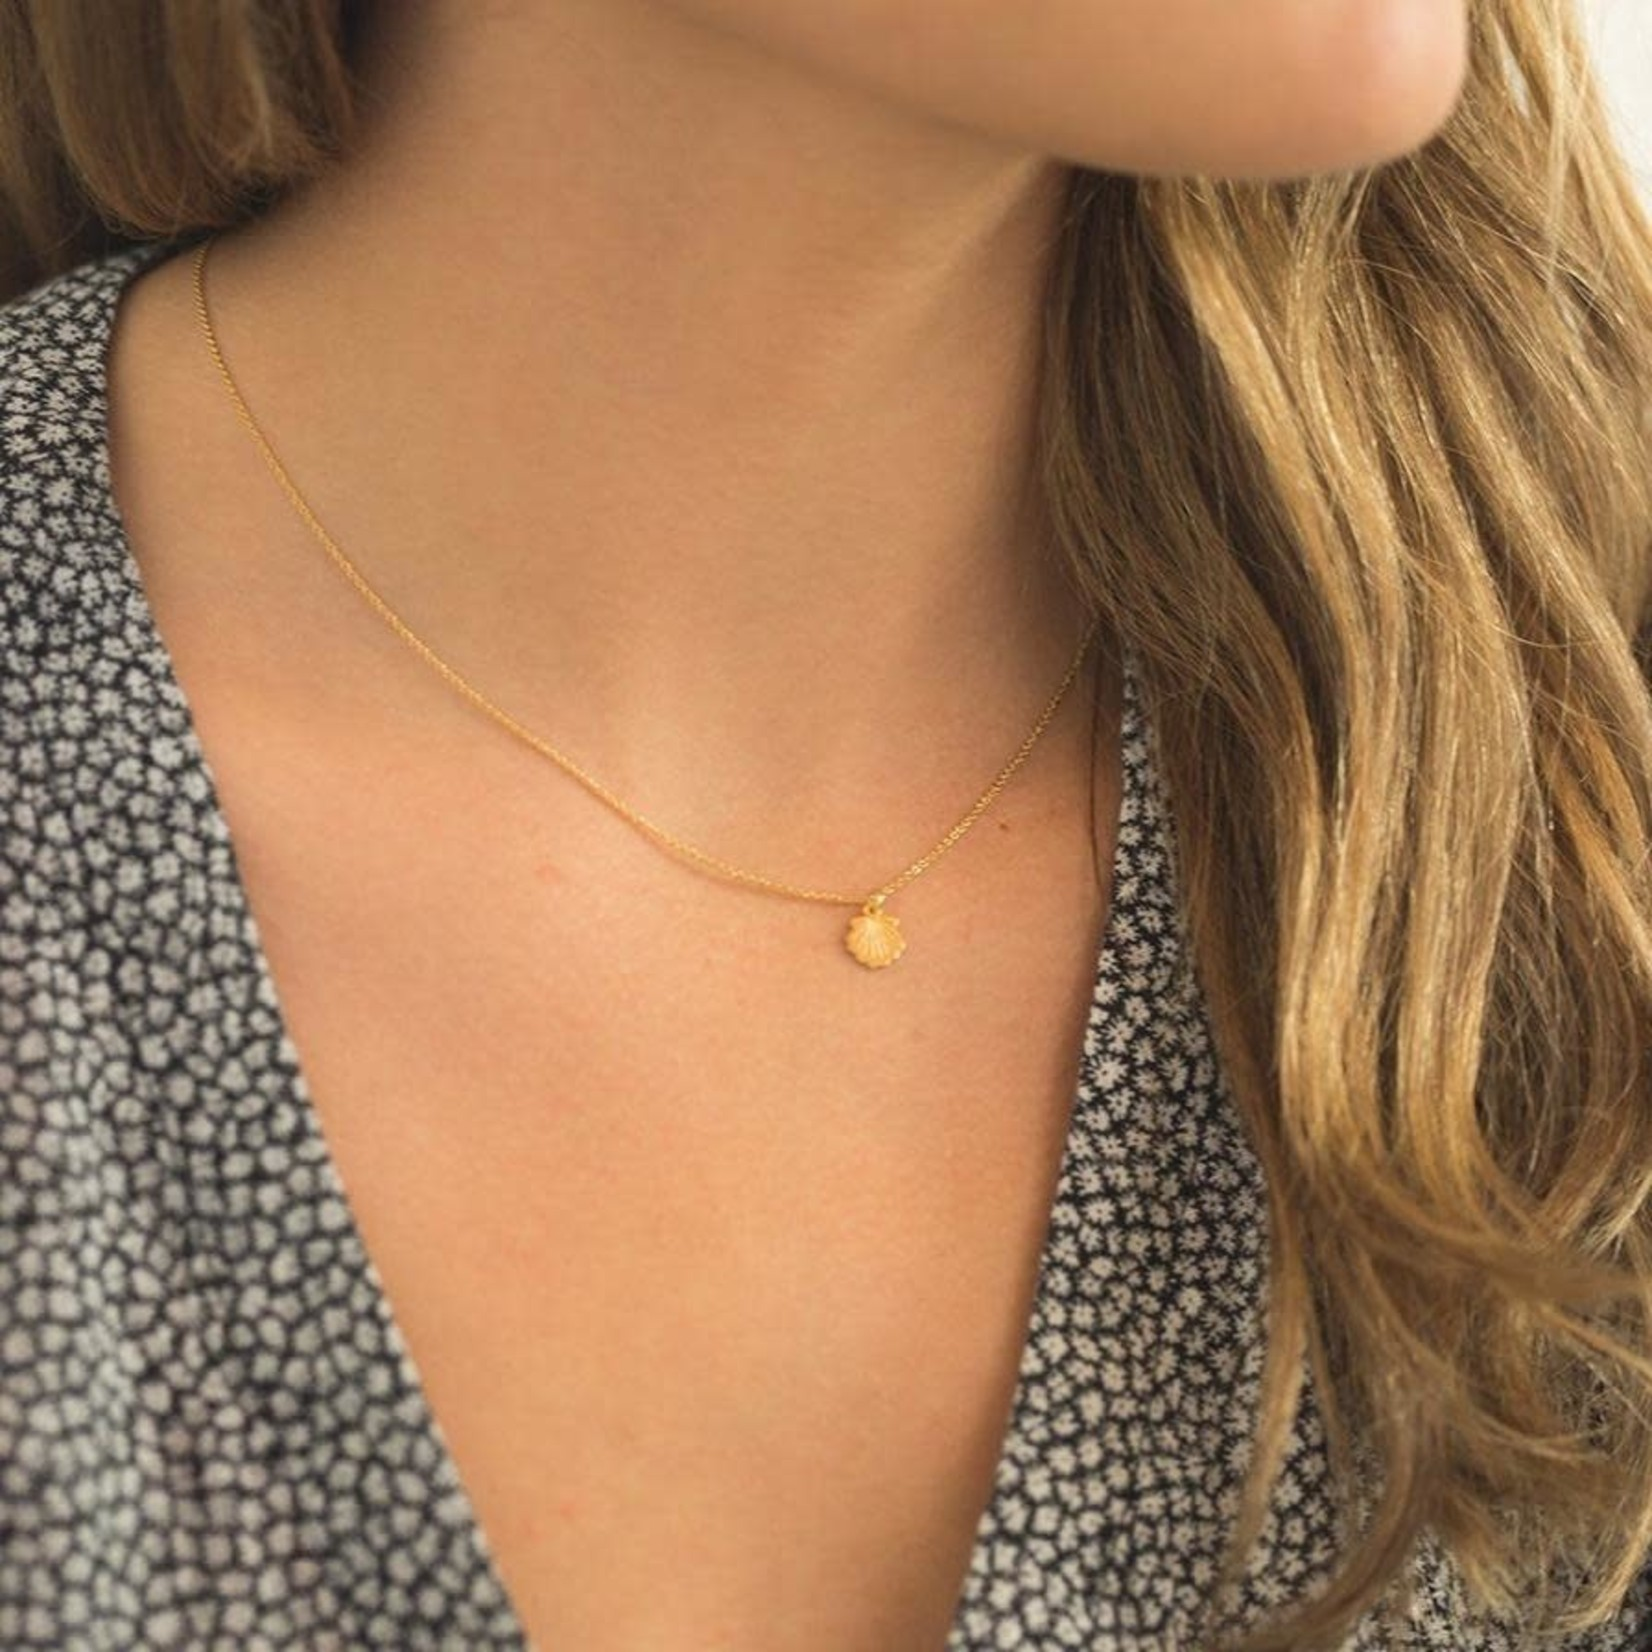 Honeycat Jewelry Honeycat Magic Charm Shell Necklace